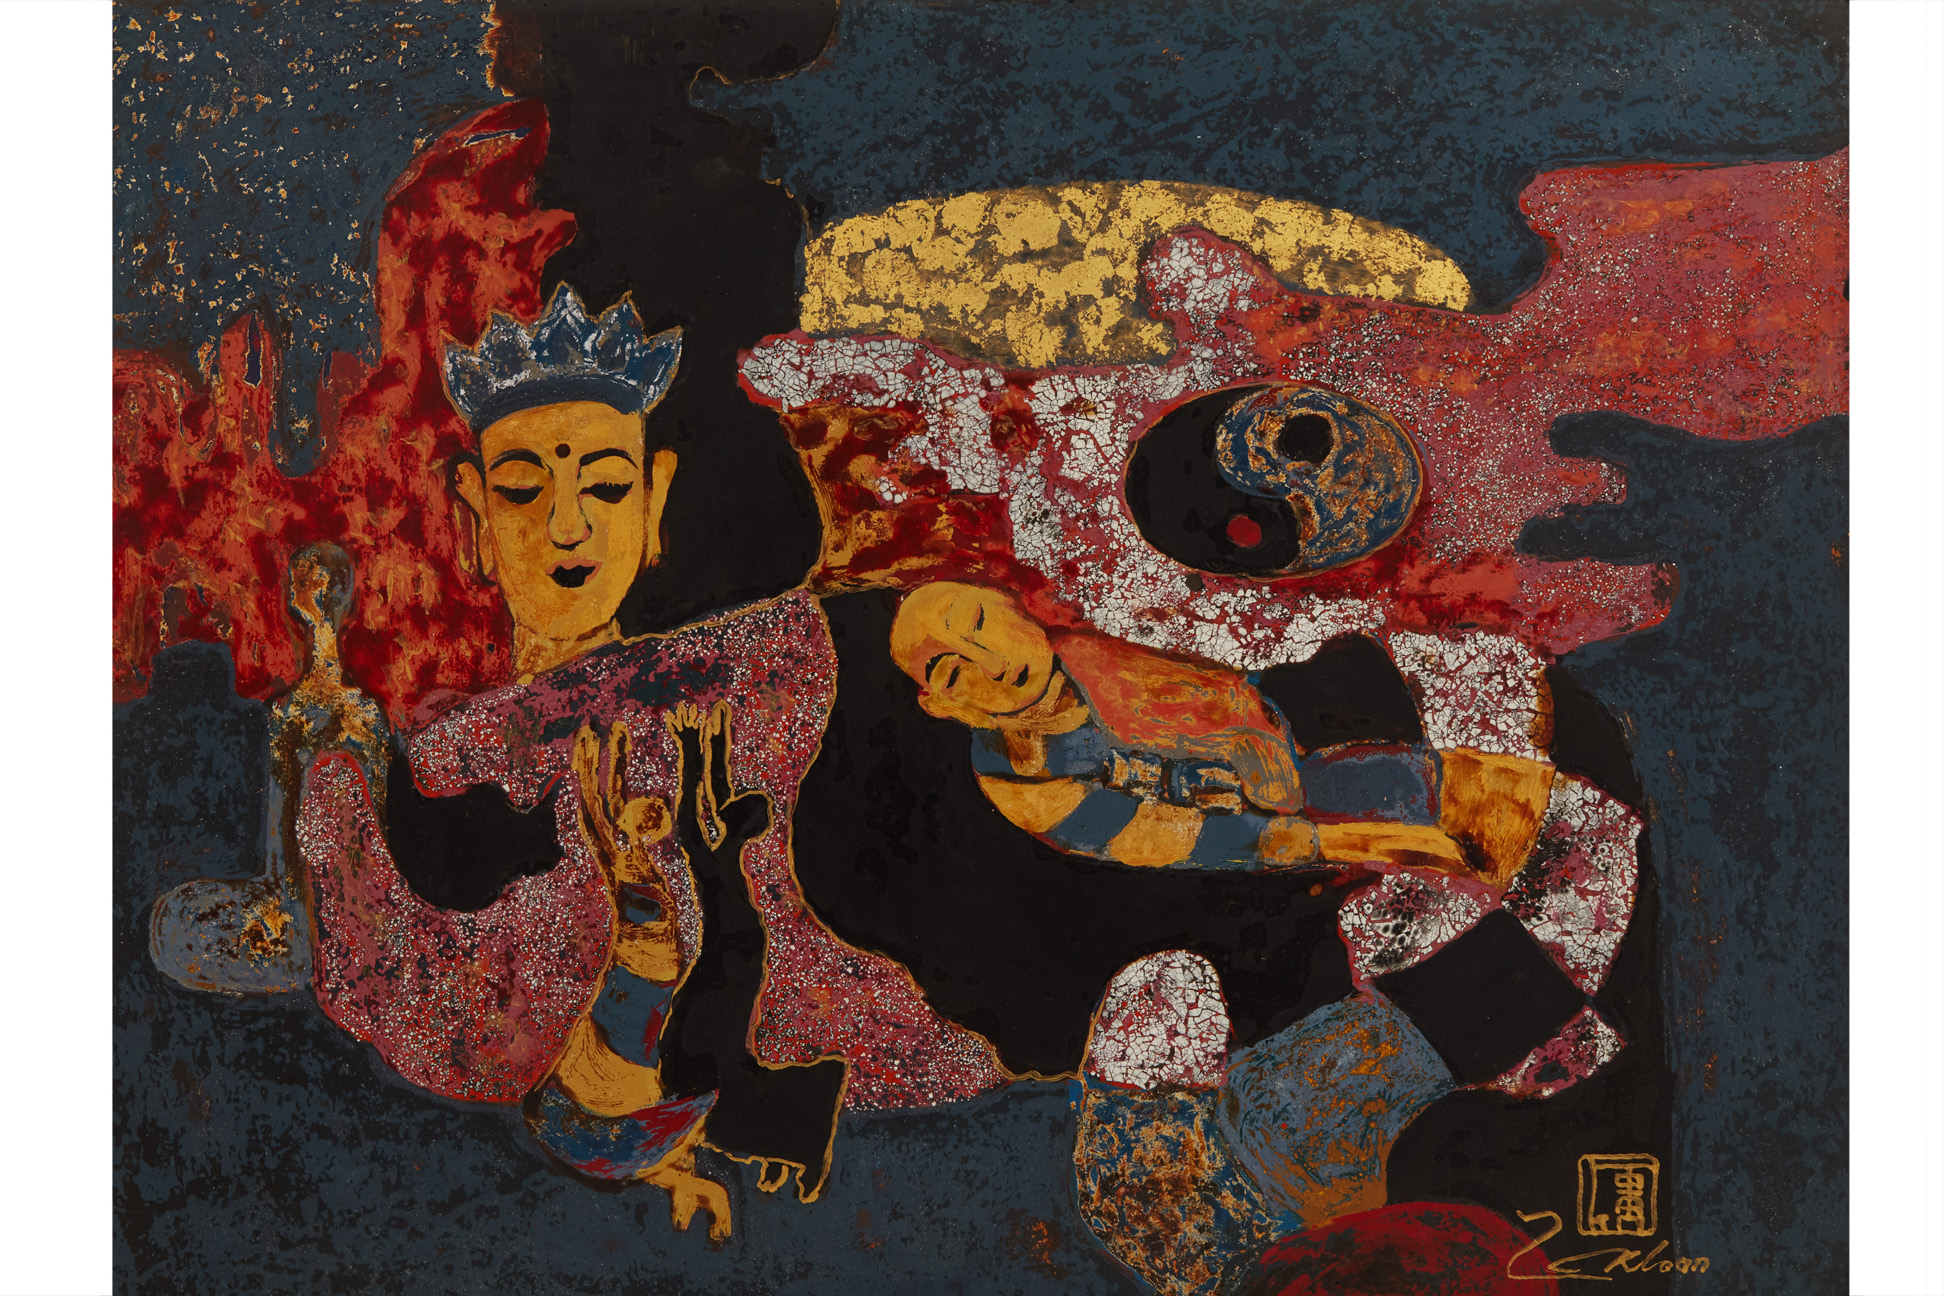 LUONG KHANH TOAN (VIETNAMESE, B.1966) - UNTITLED